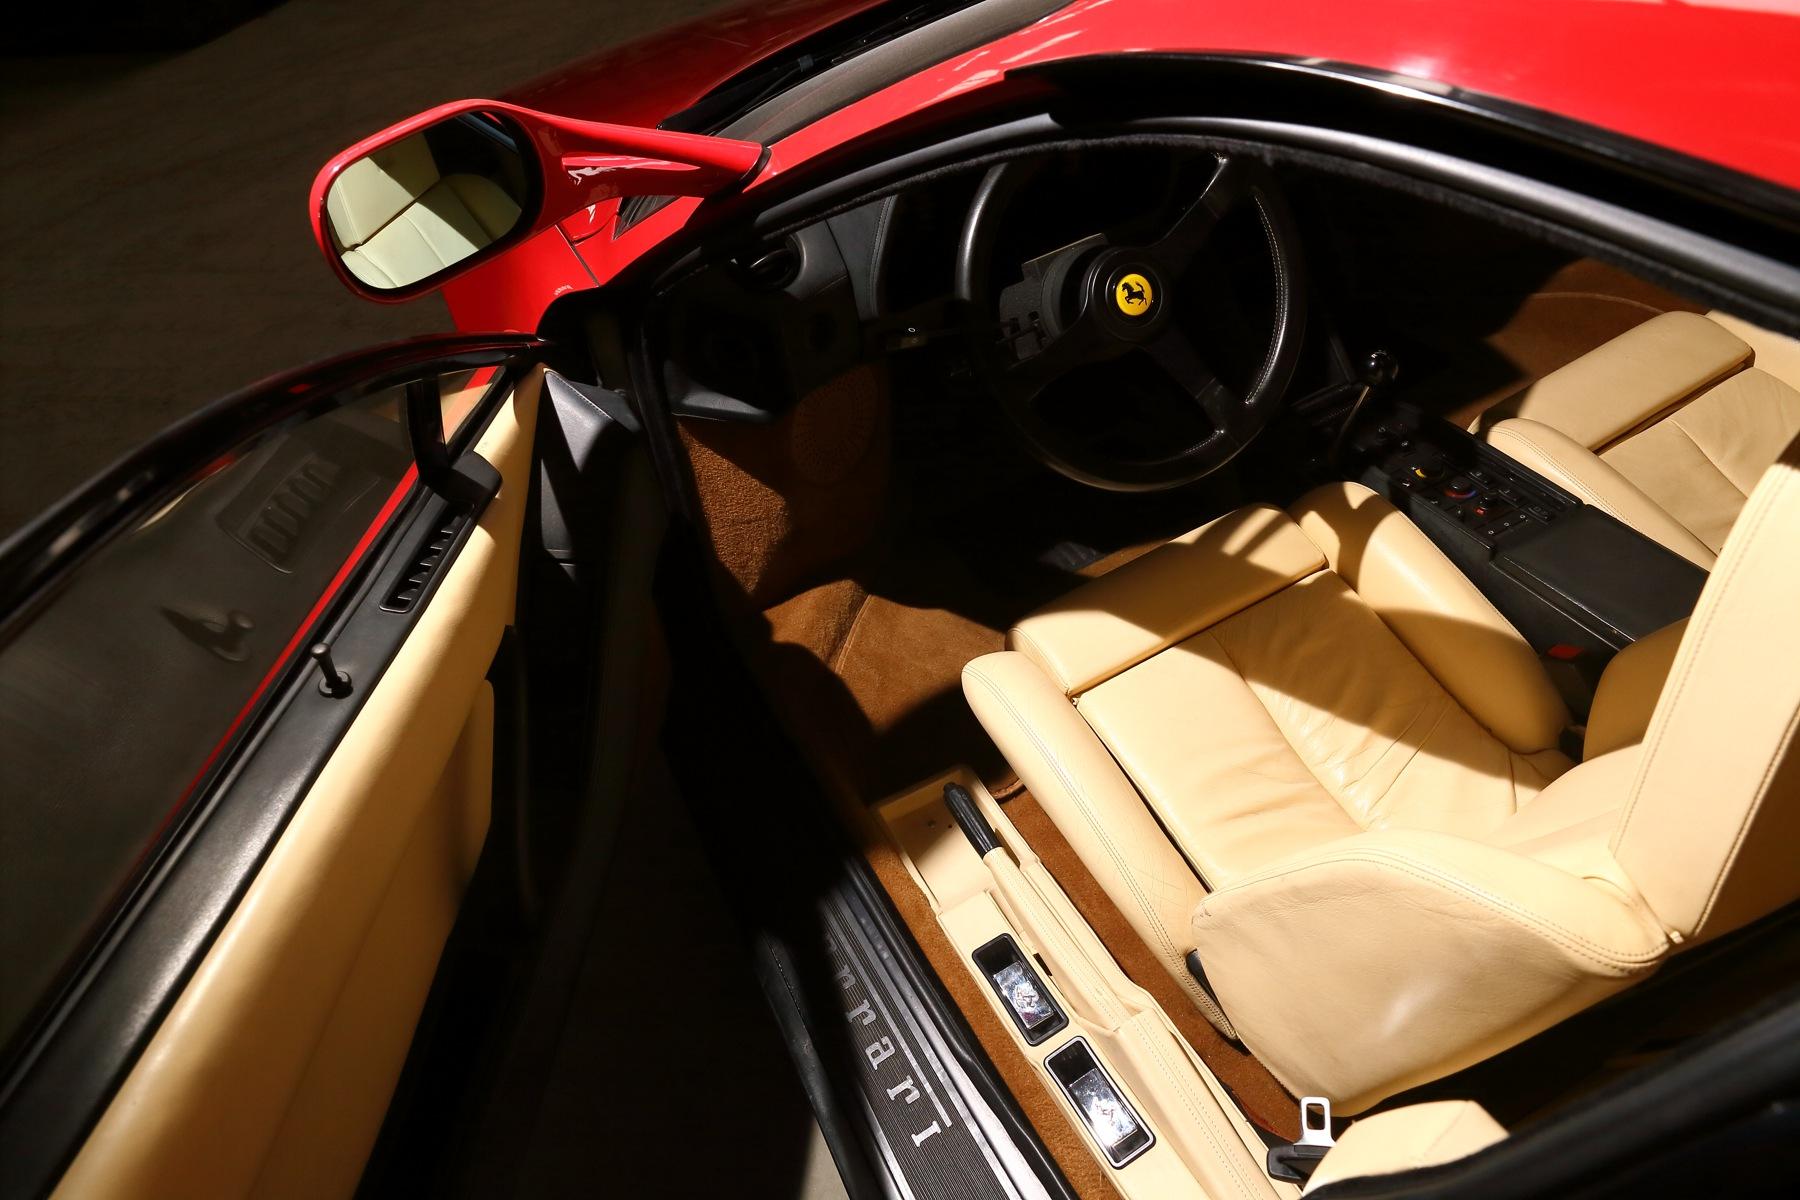 010 2016_03_16_Ferrari Testarossa I 078